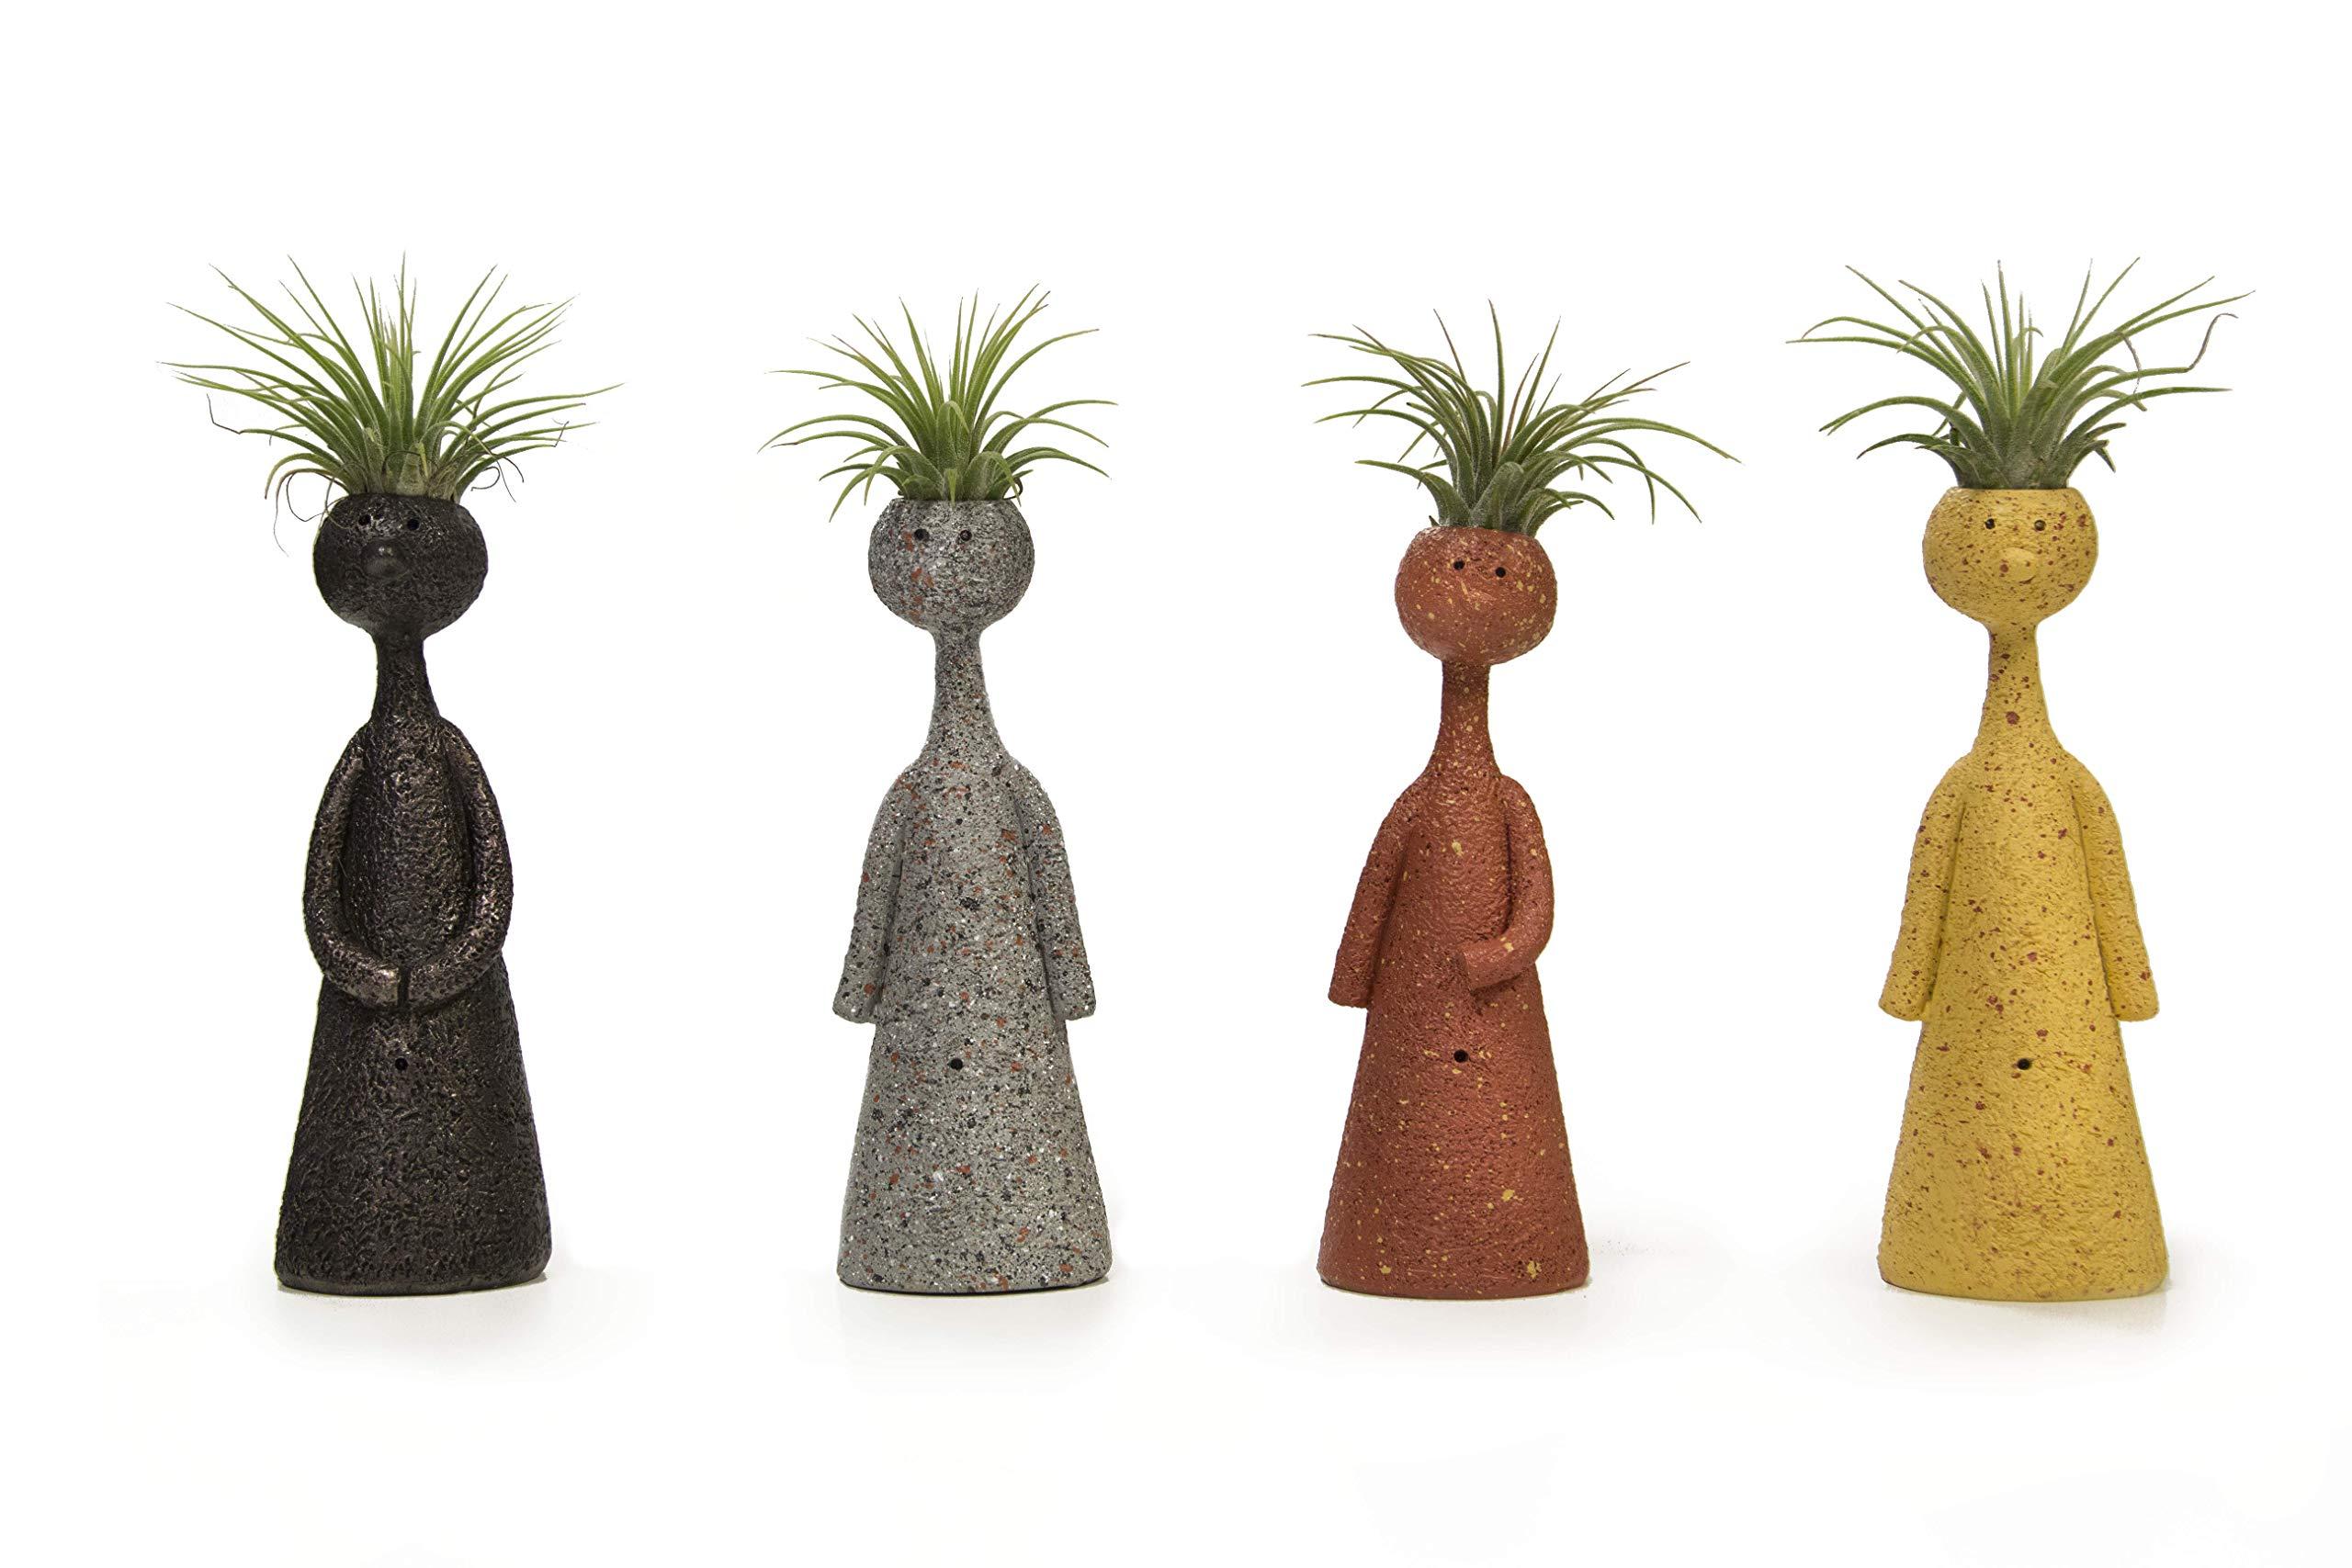 LiveTrends Design LT LiveTrends -Thinkers (Set of 4) Living Plant Décor, Assorted by LiveTrends Design